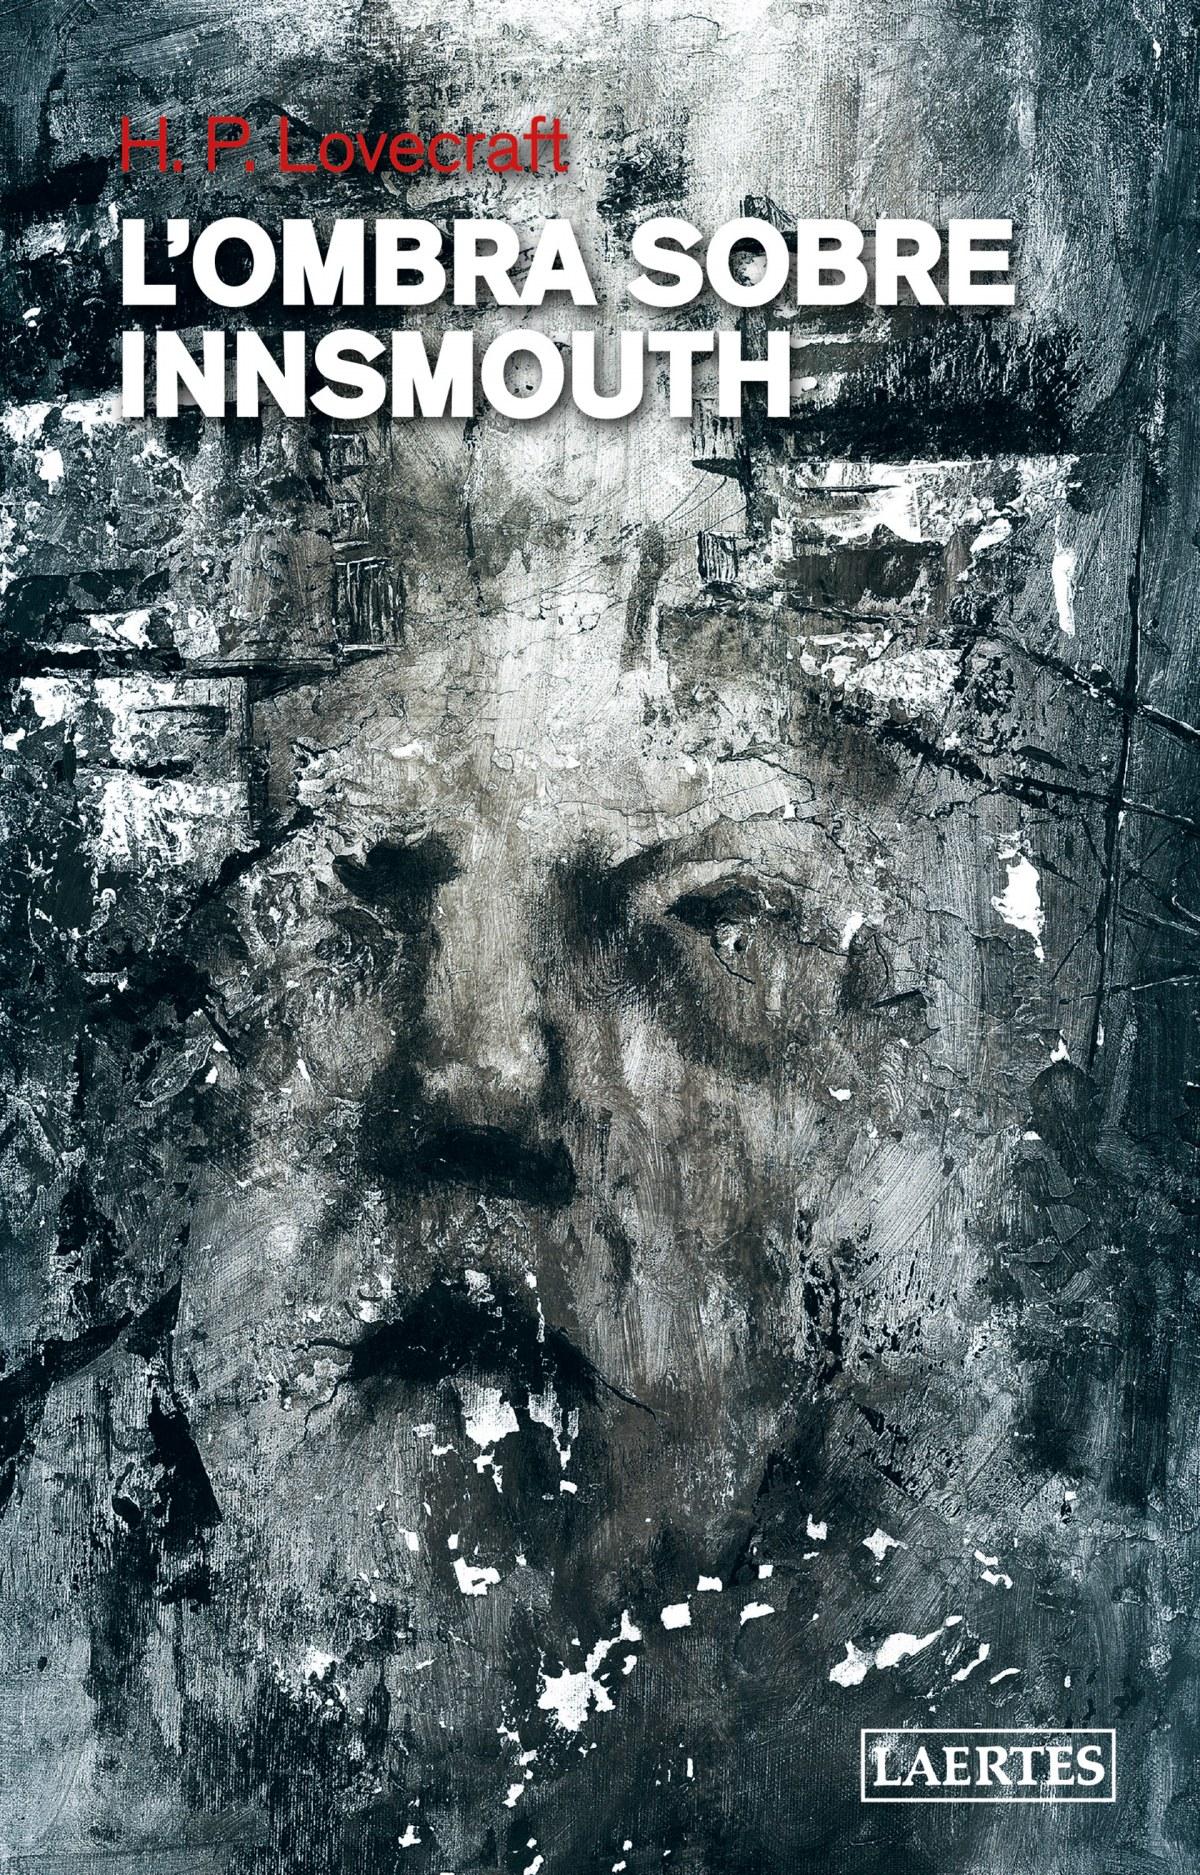 L'ombra sobre Innsmouth